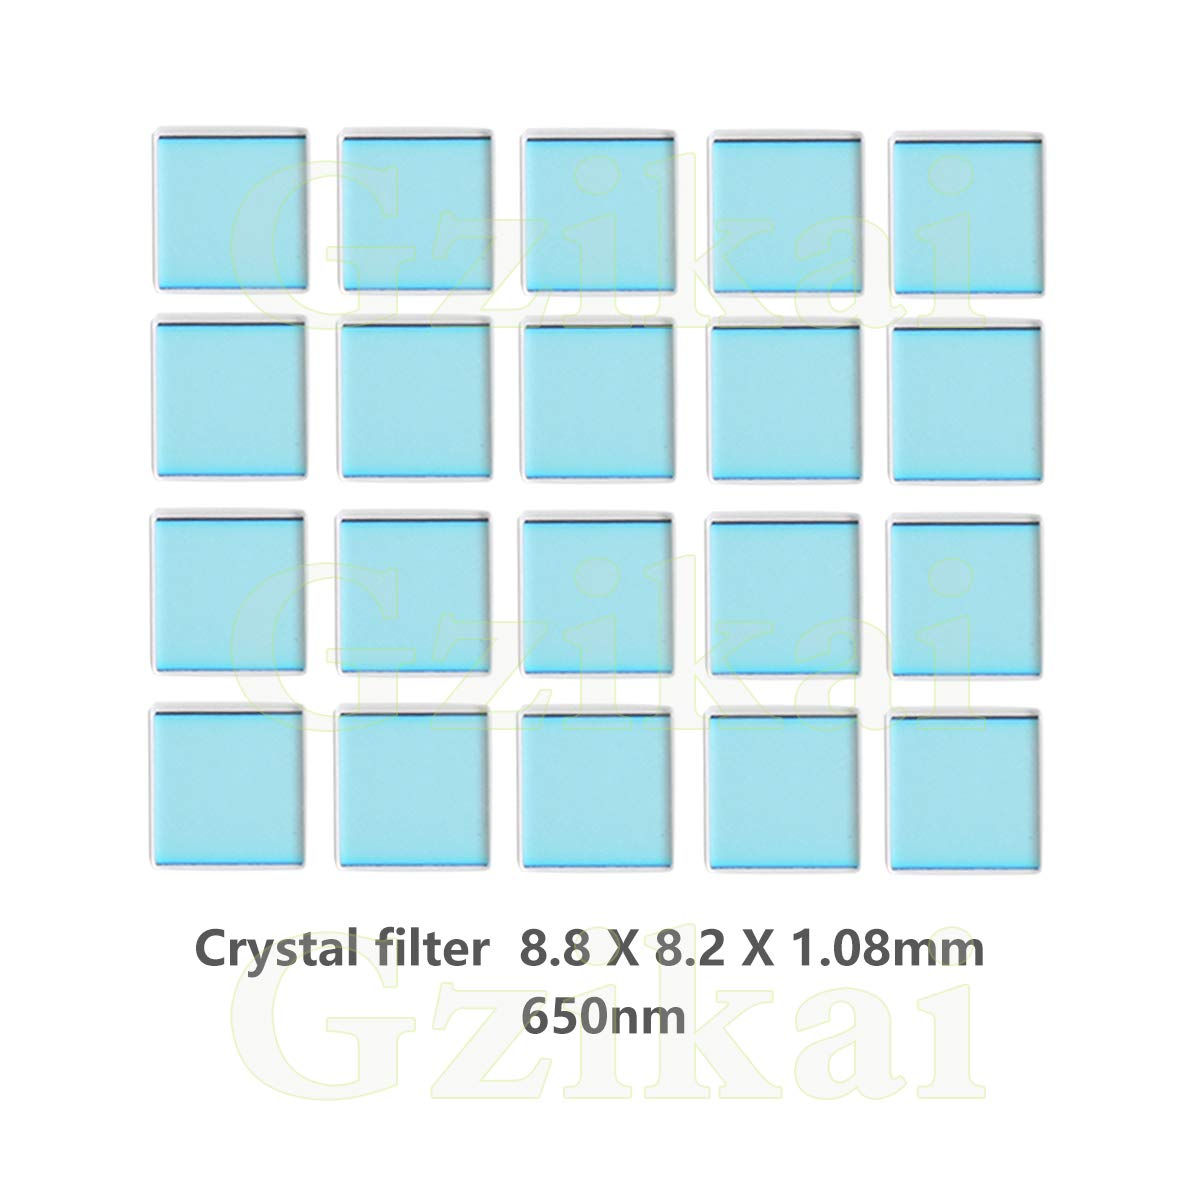 Gzikai 20pcs/1 Lot 8.8mm×8.2mm×1.08mm 650nm IR-Cut Blocking Filter Square Optical Low-Pass Infrared Block Filters for Camera Lens by Gzikai